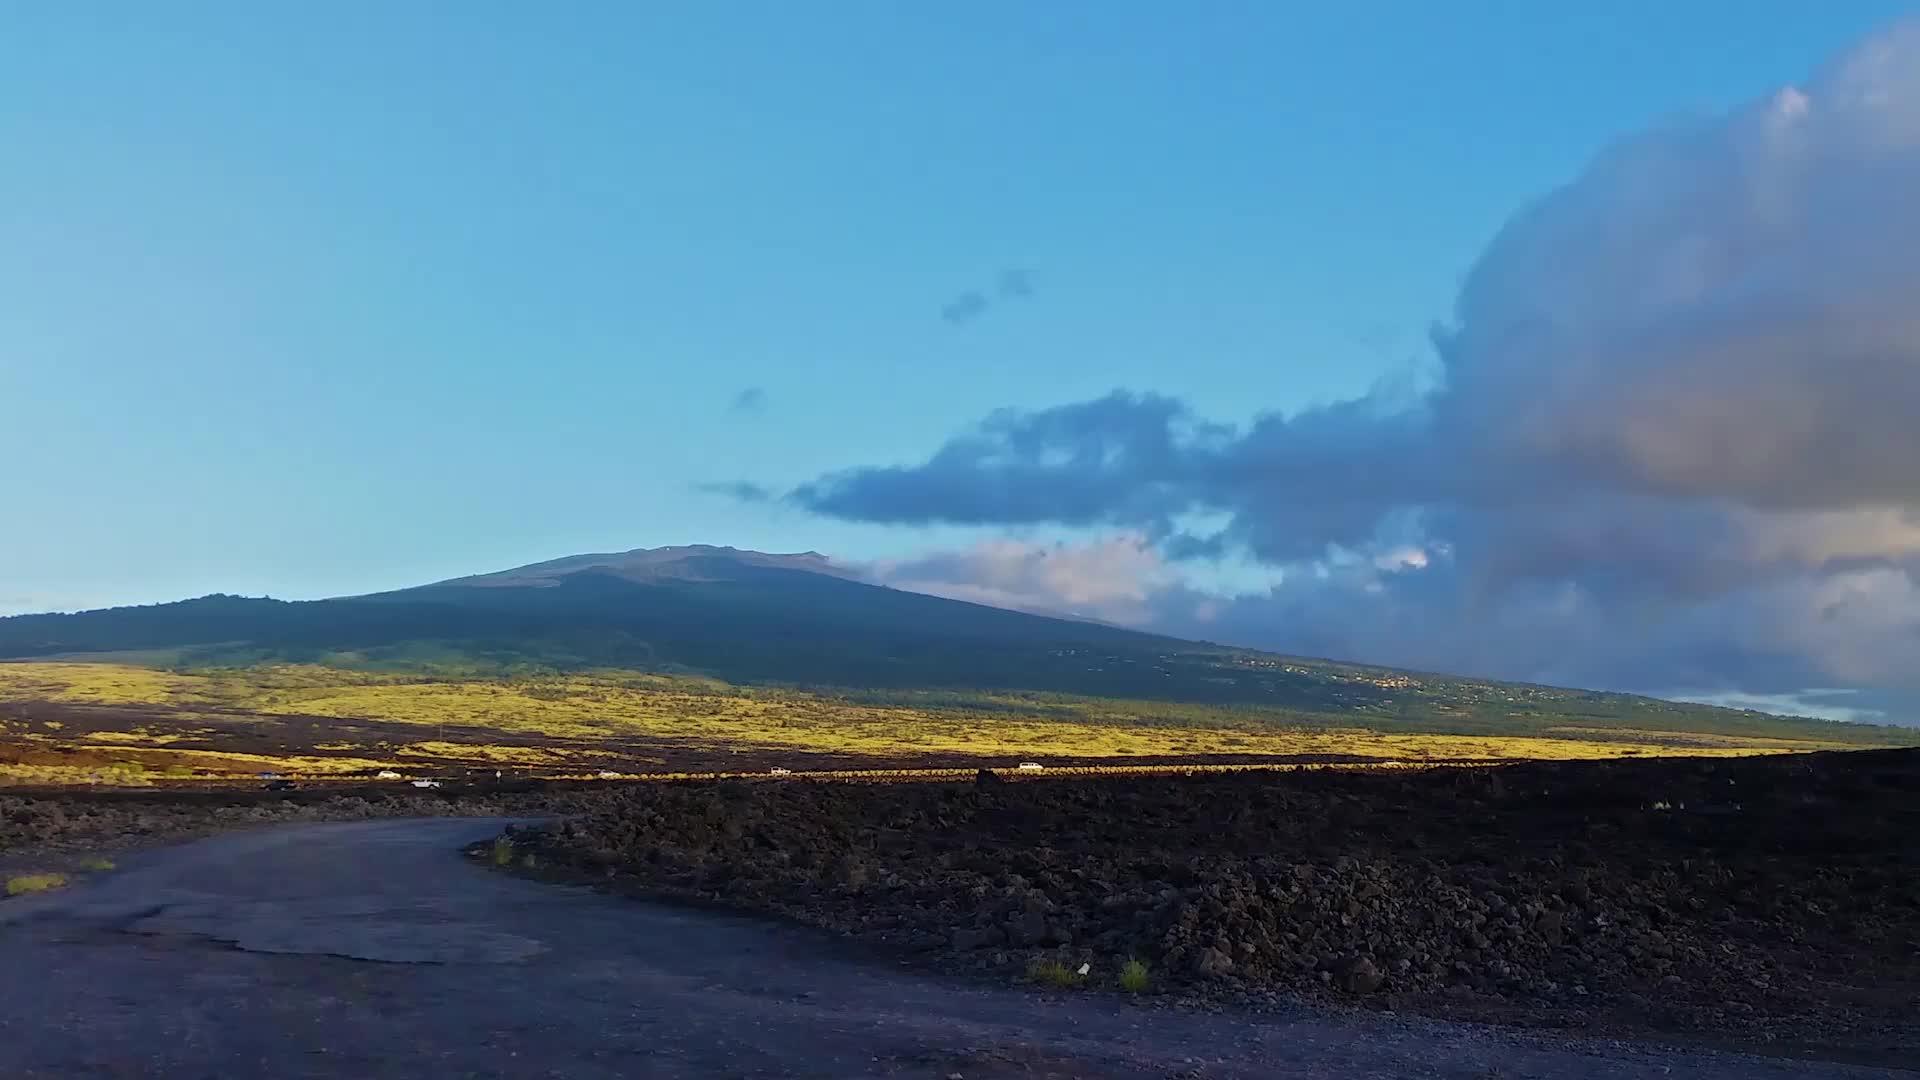 Hawaii's Mauna Loa Loses its Distinction as Largest Shield Volcano